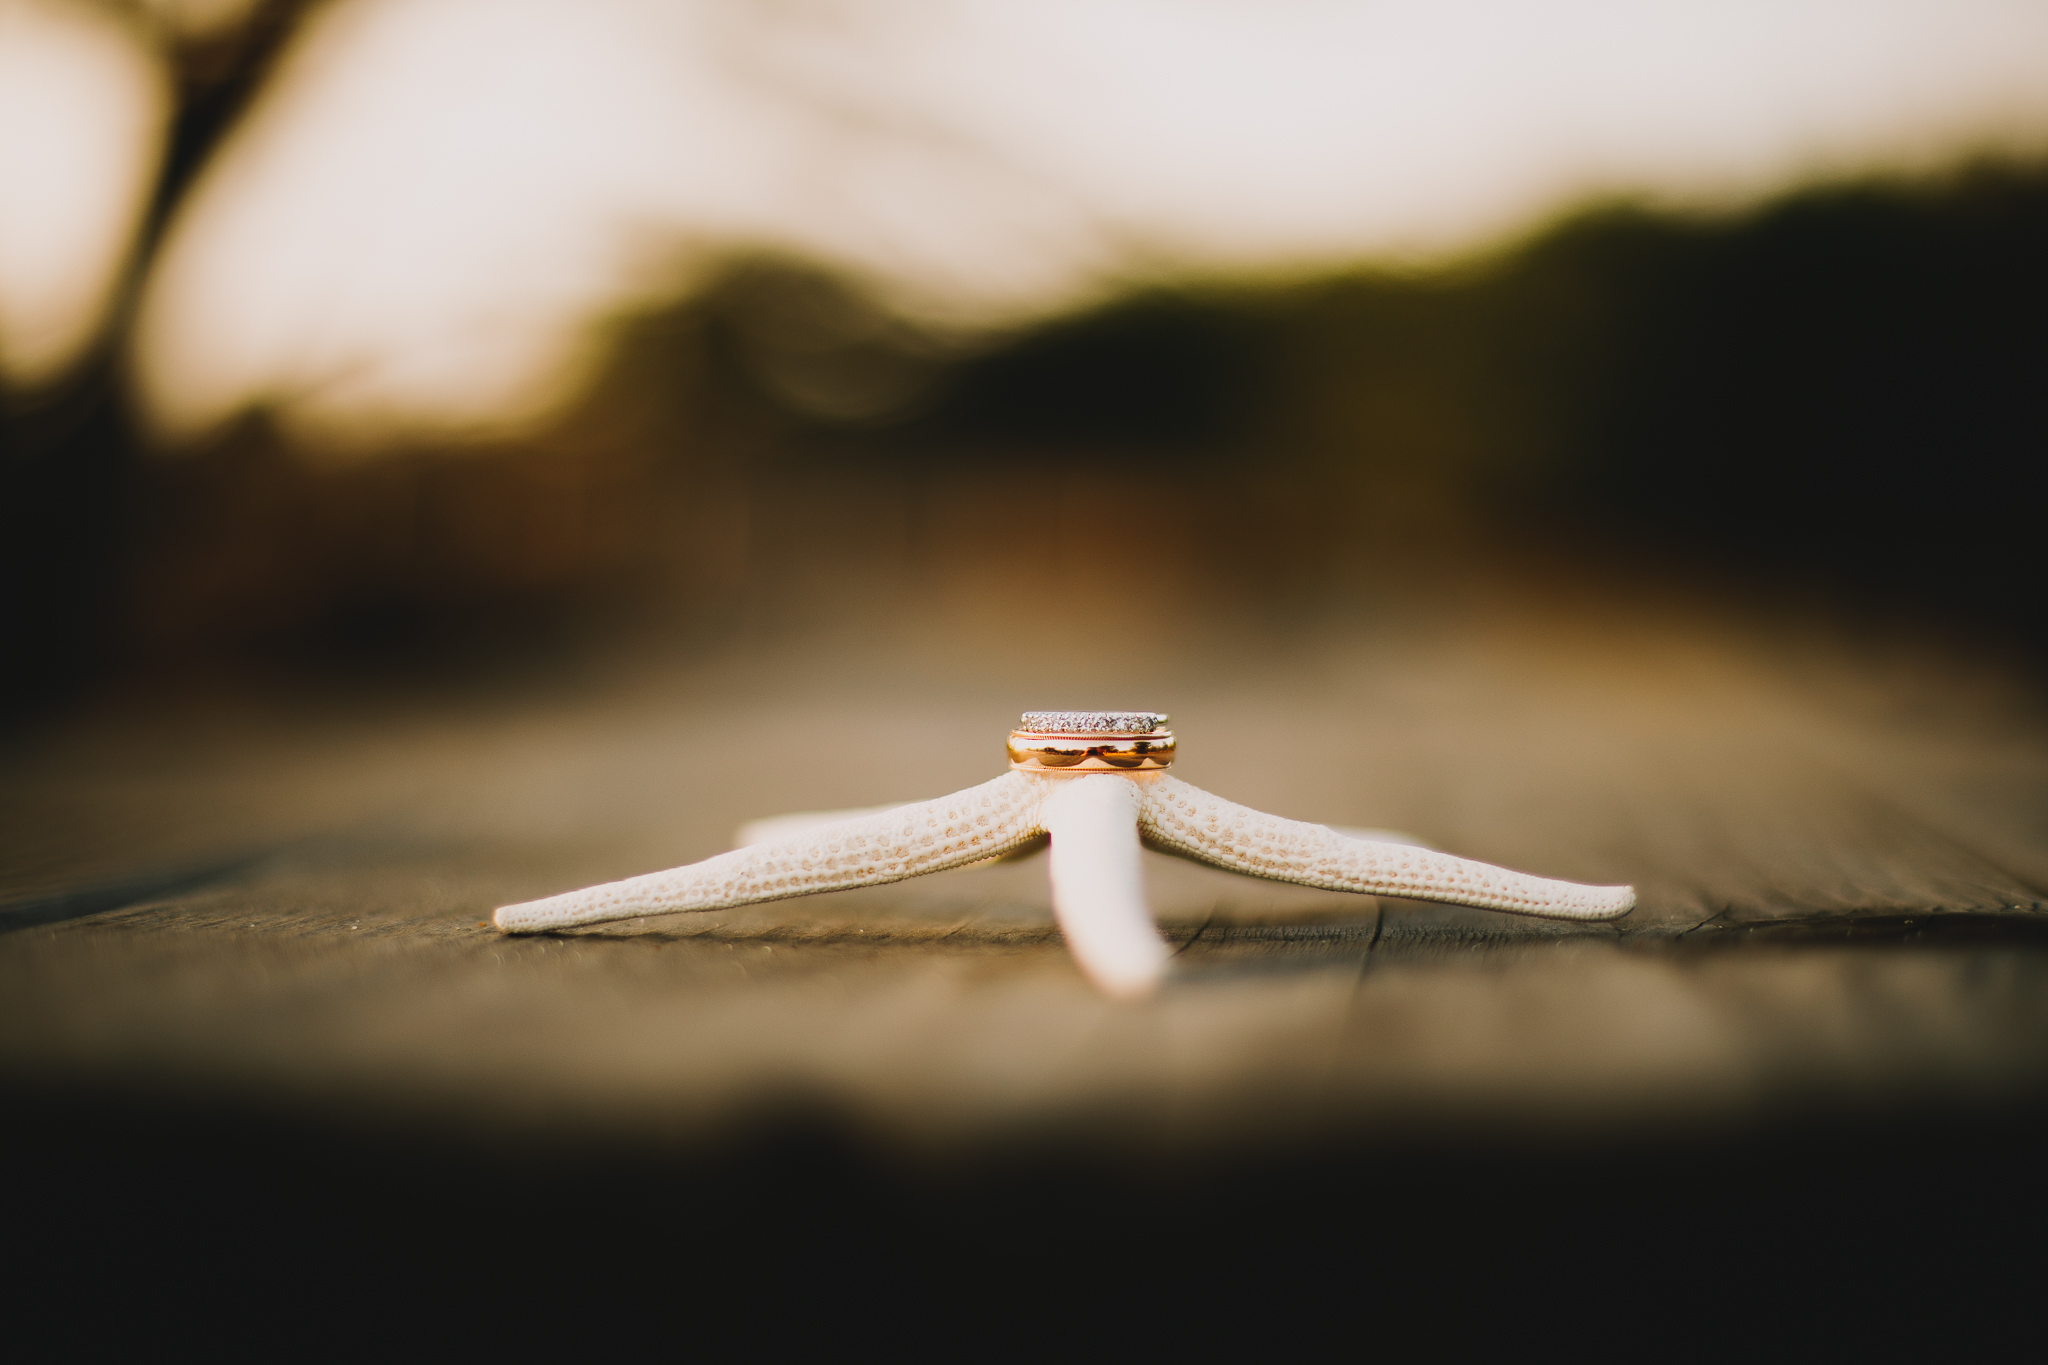 Archer_Inspired_Photography_Pacific_Grove_Ansilomar_Beach_Carmel_Valley_Wedding-150.jpg